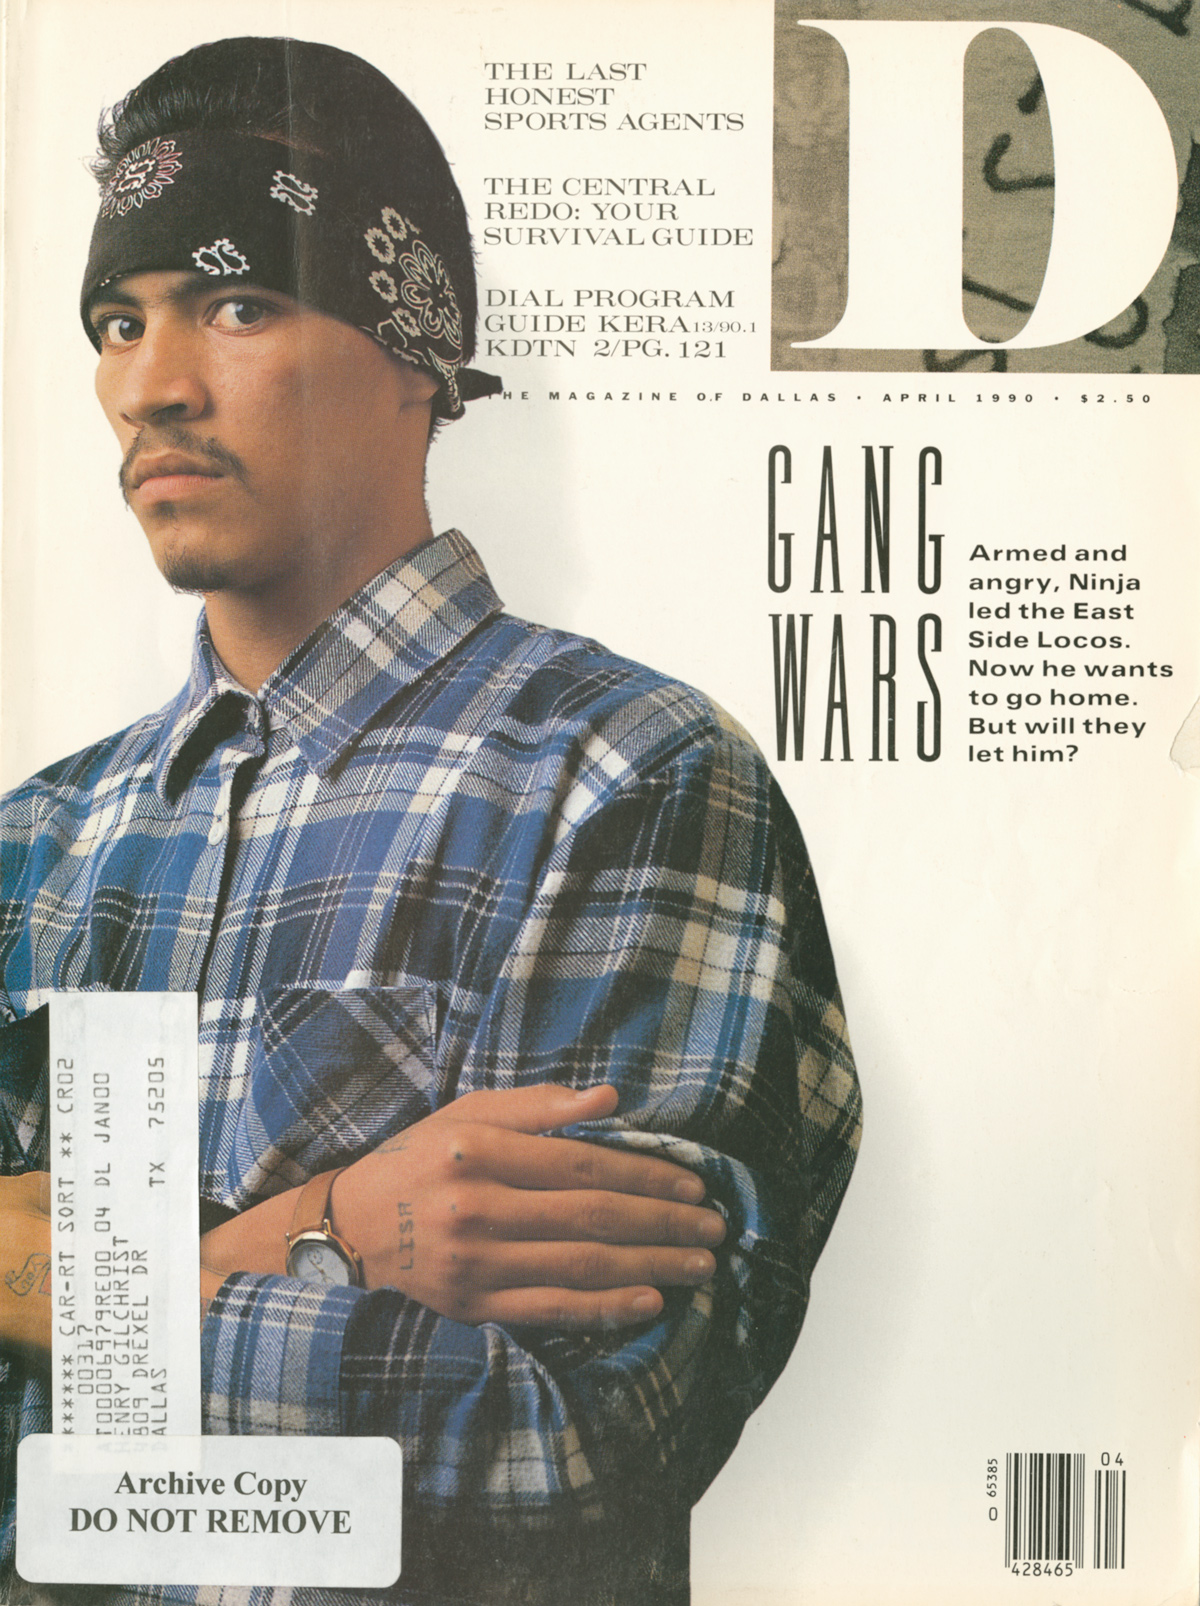 April 1990 cover